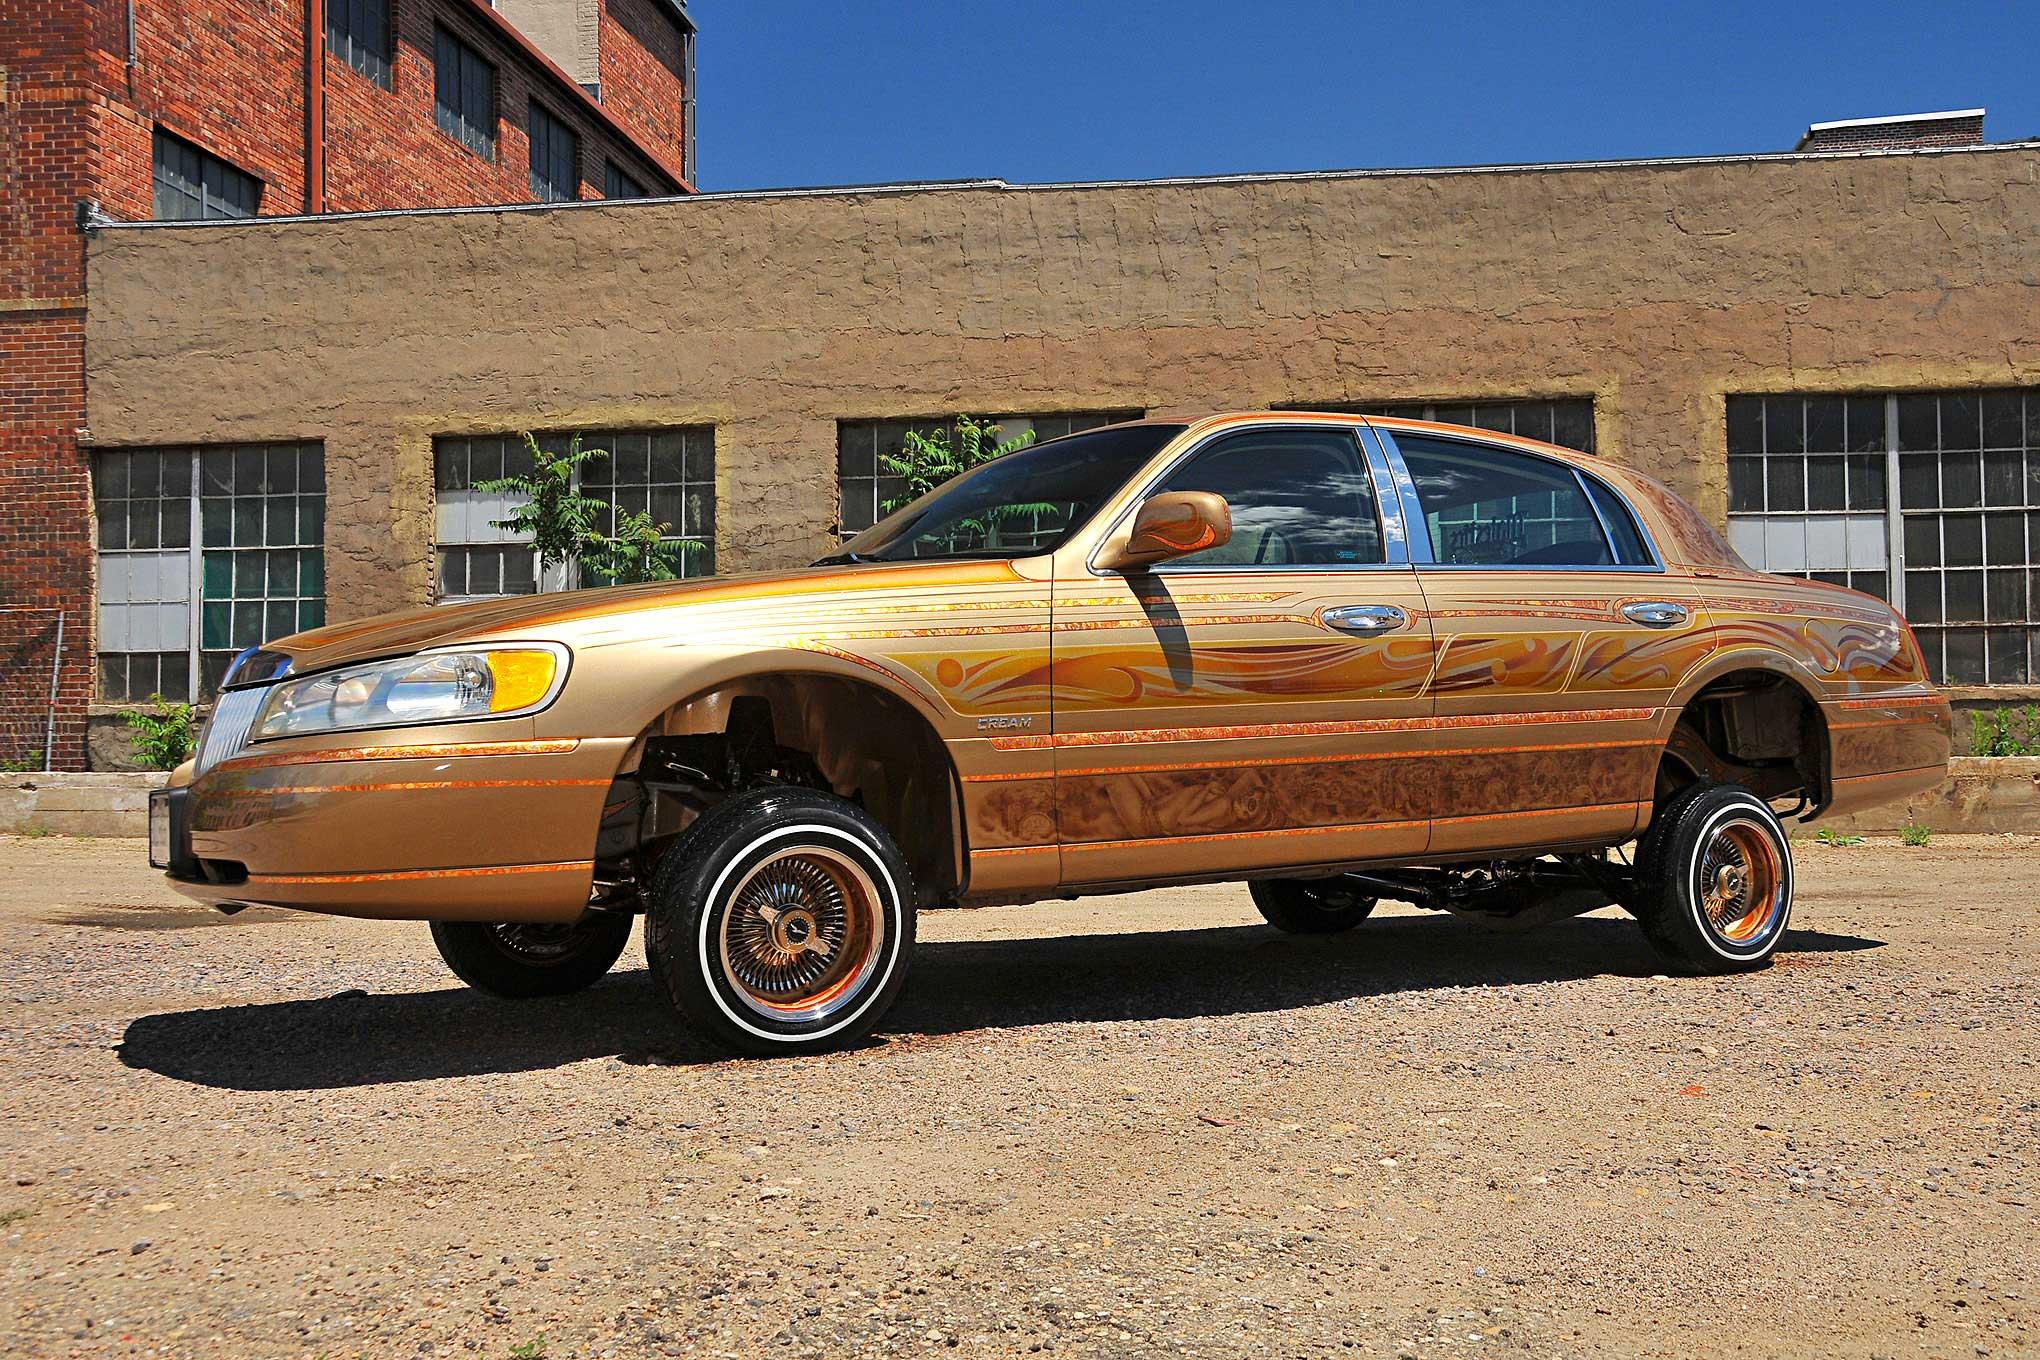 1998 lincoln town car life 39 s golden. Black Bedroom Furniture Sets. Home Design Ideas